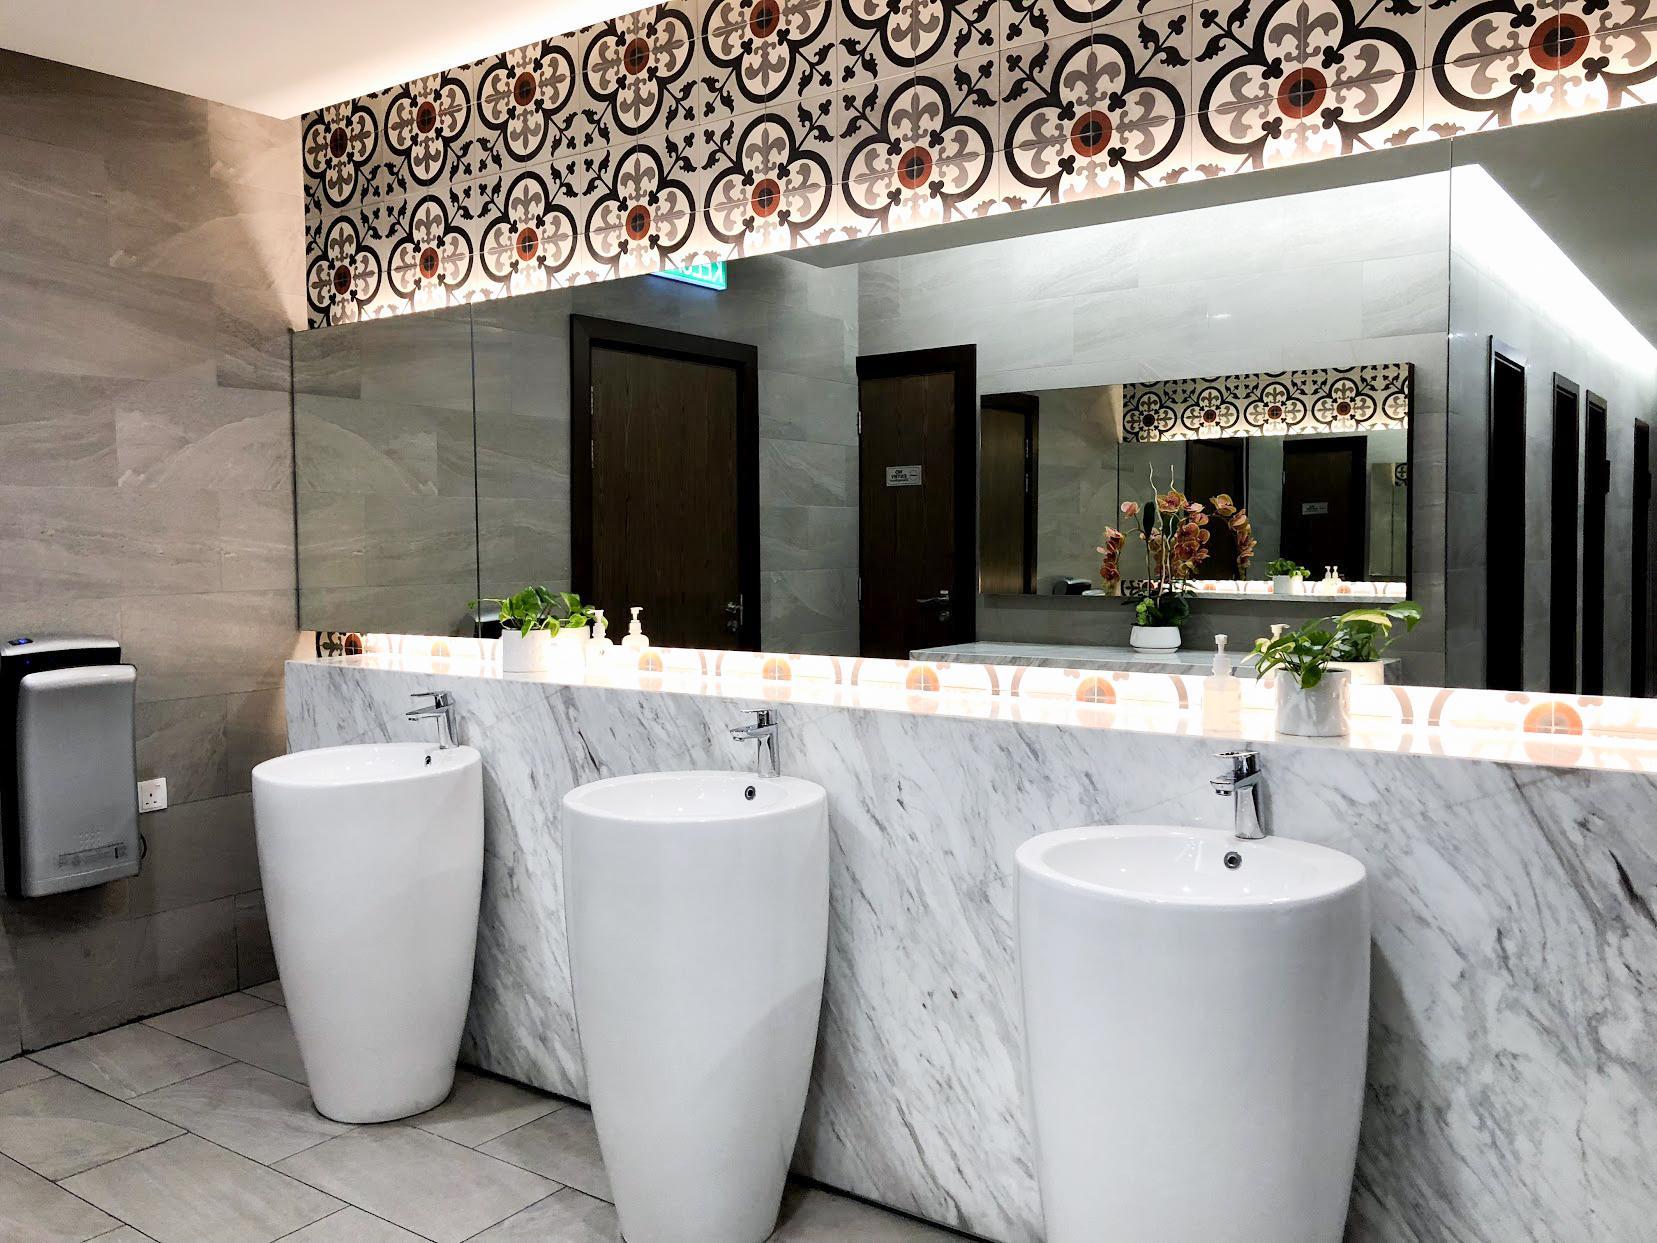 Malaysia Airlines Satellite Golden Lounge Kuala Lumpur bathroom